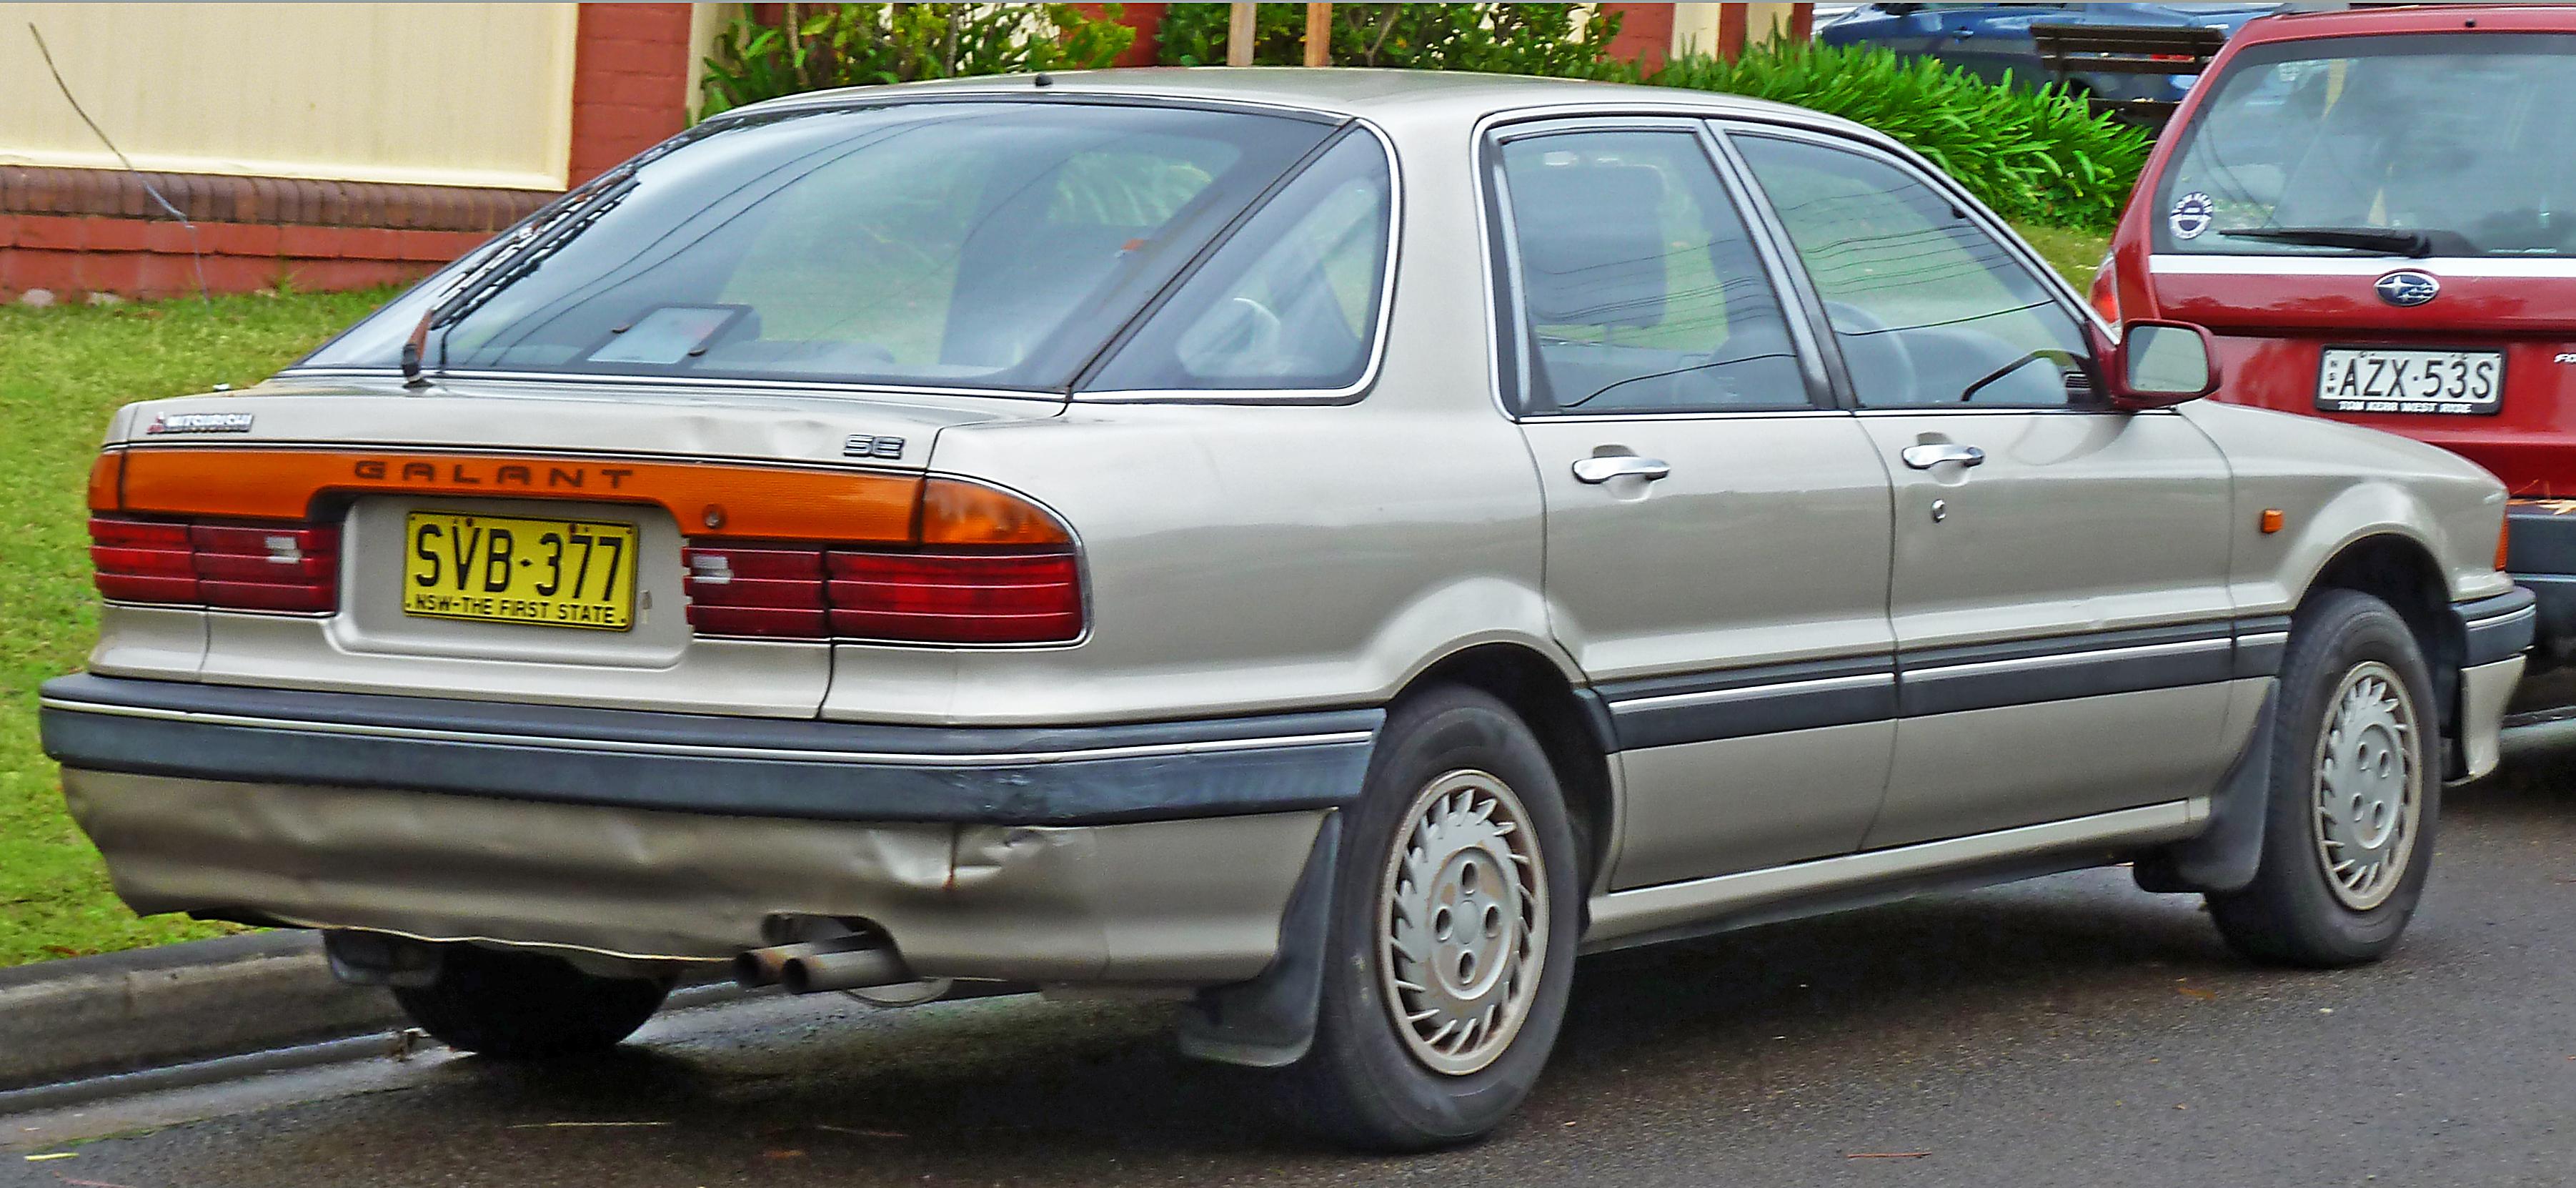 1991 Mitsubishi Galant Information And Photos Zombiedrive